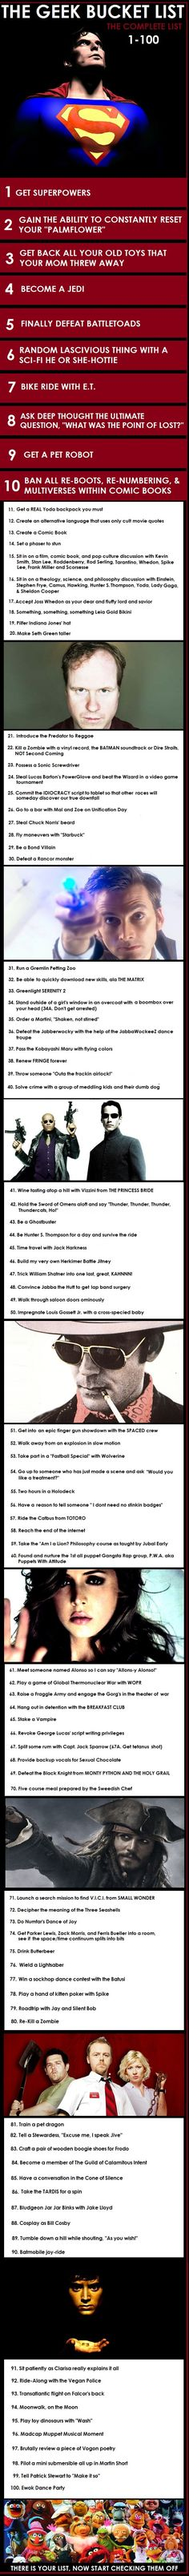 The Geek Bucket List #infographic